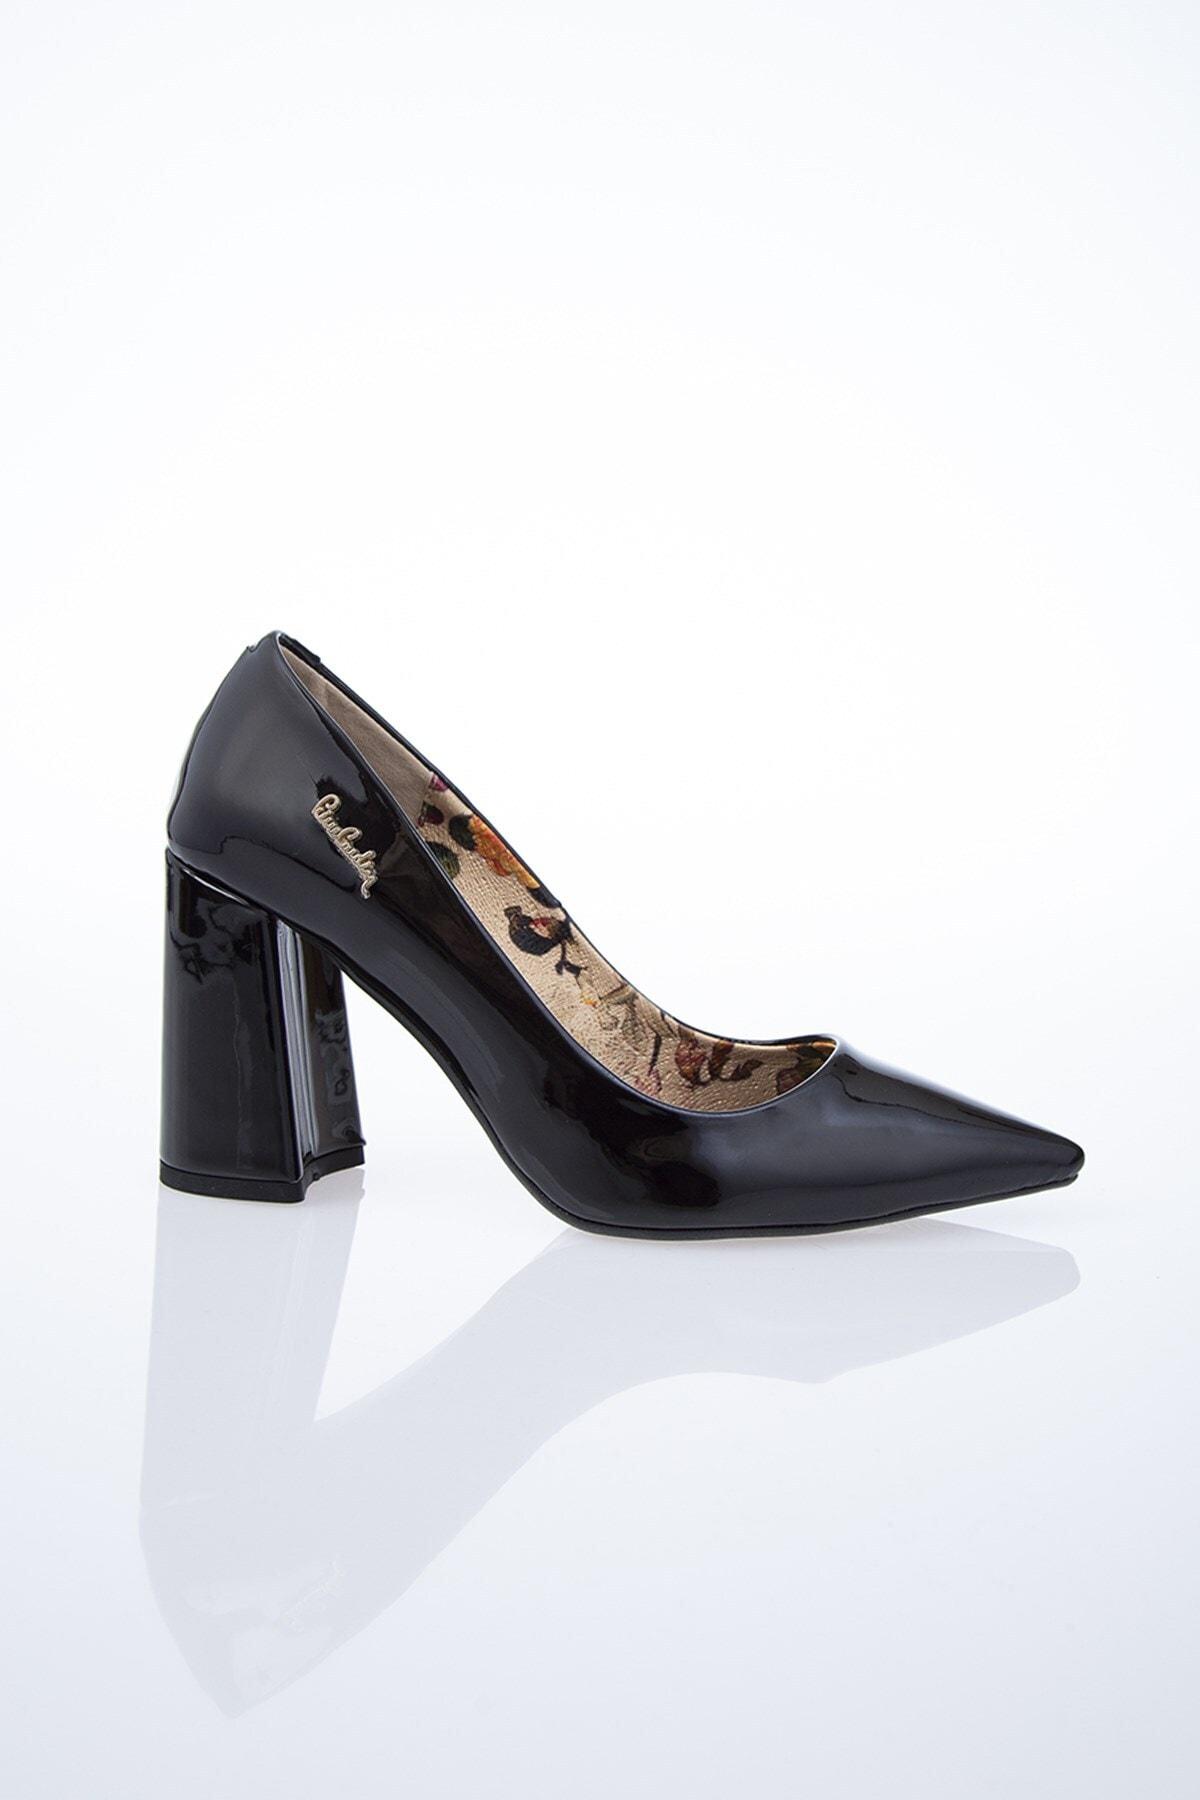 Pierre Cardin Pc-50312 - 2062-01-siyah 1